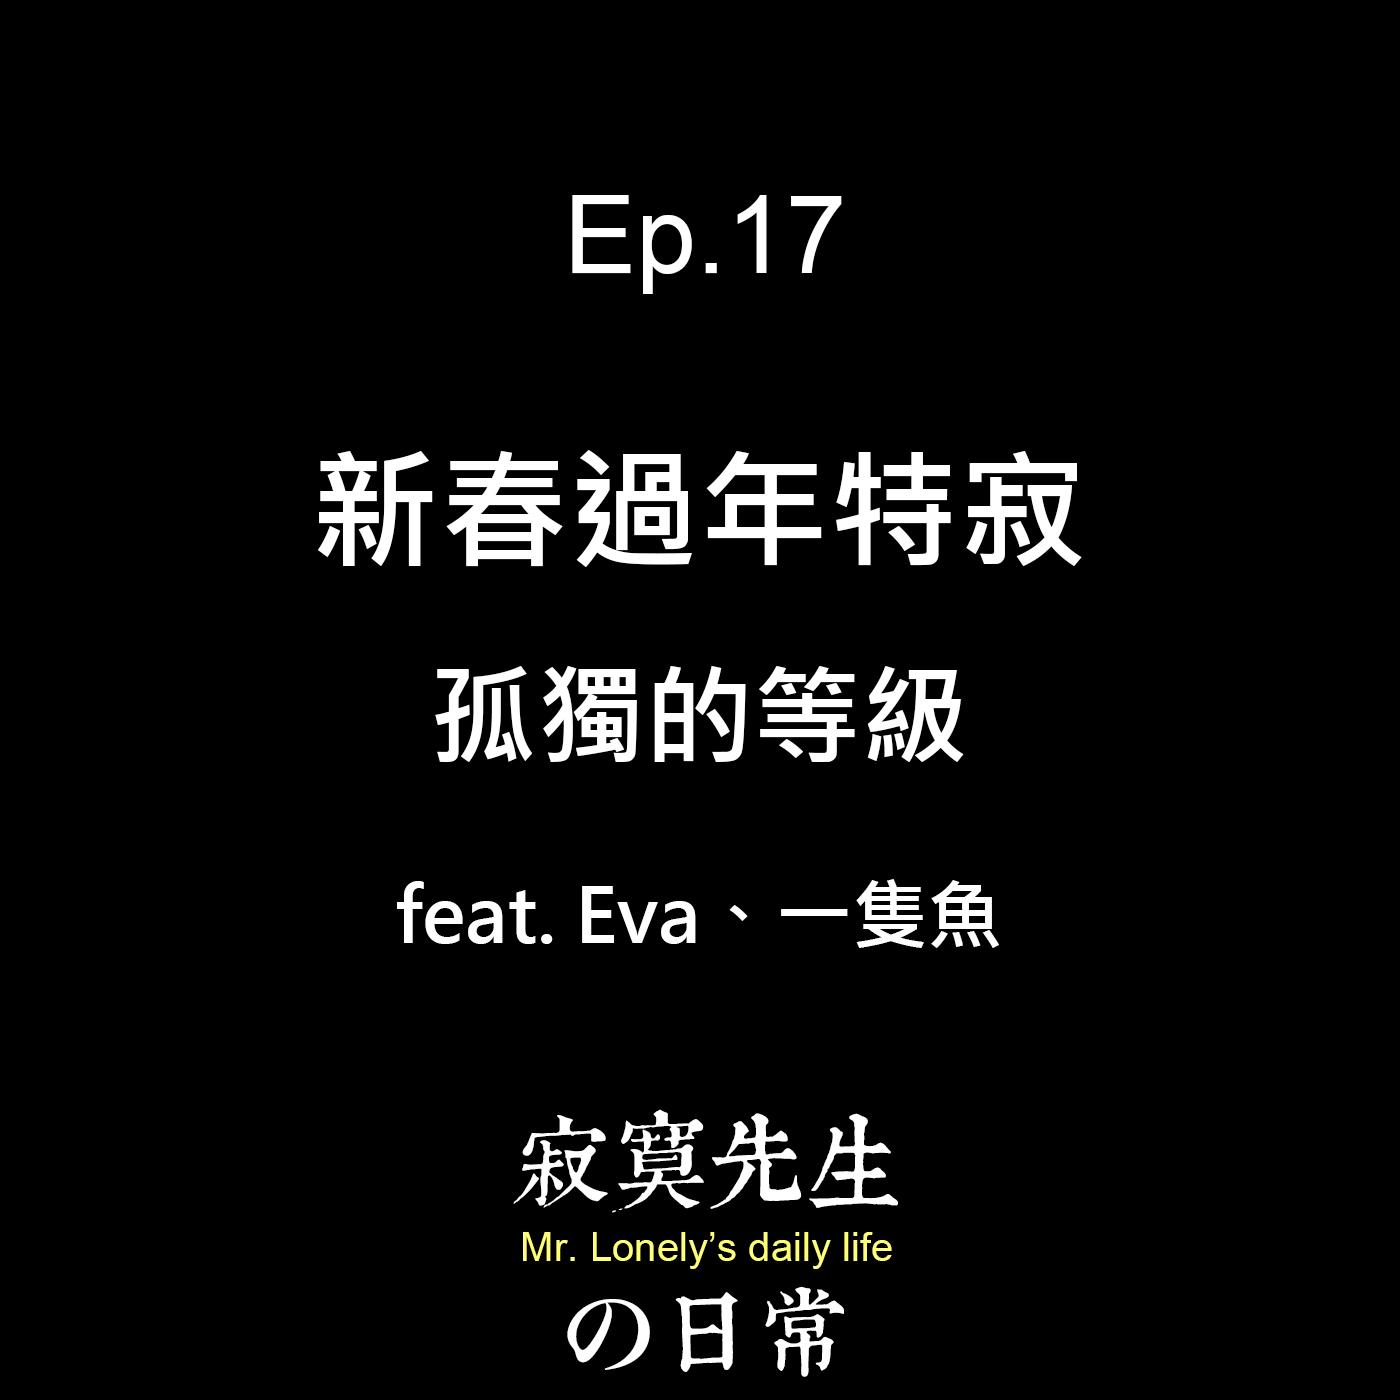 Ep.17 新春過年特寂-孤獨的等級  feat. Eva、魚